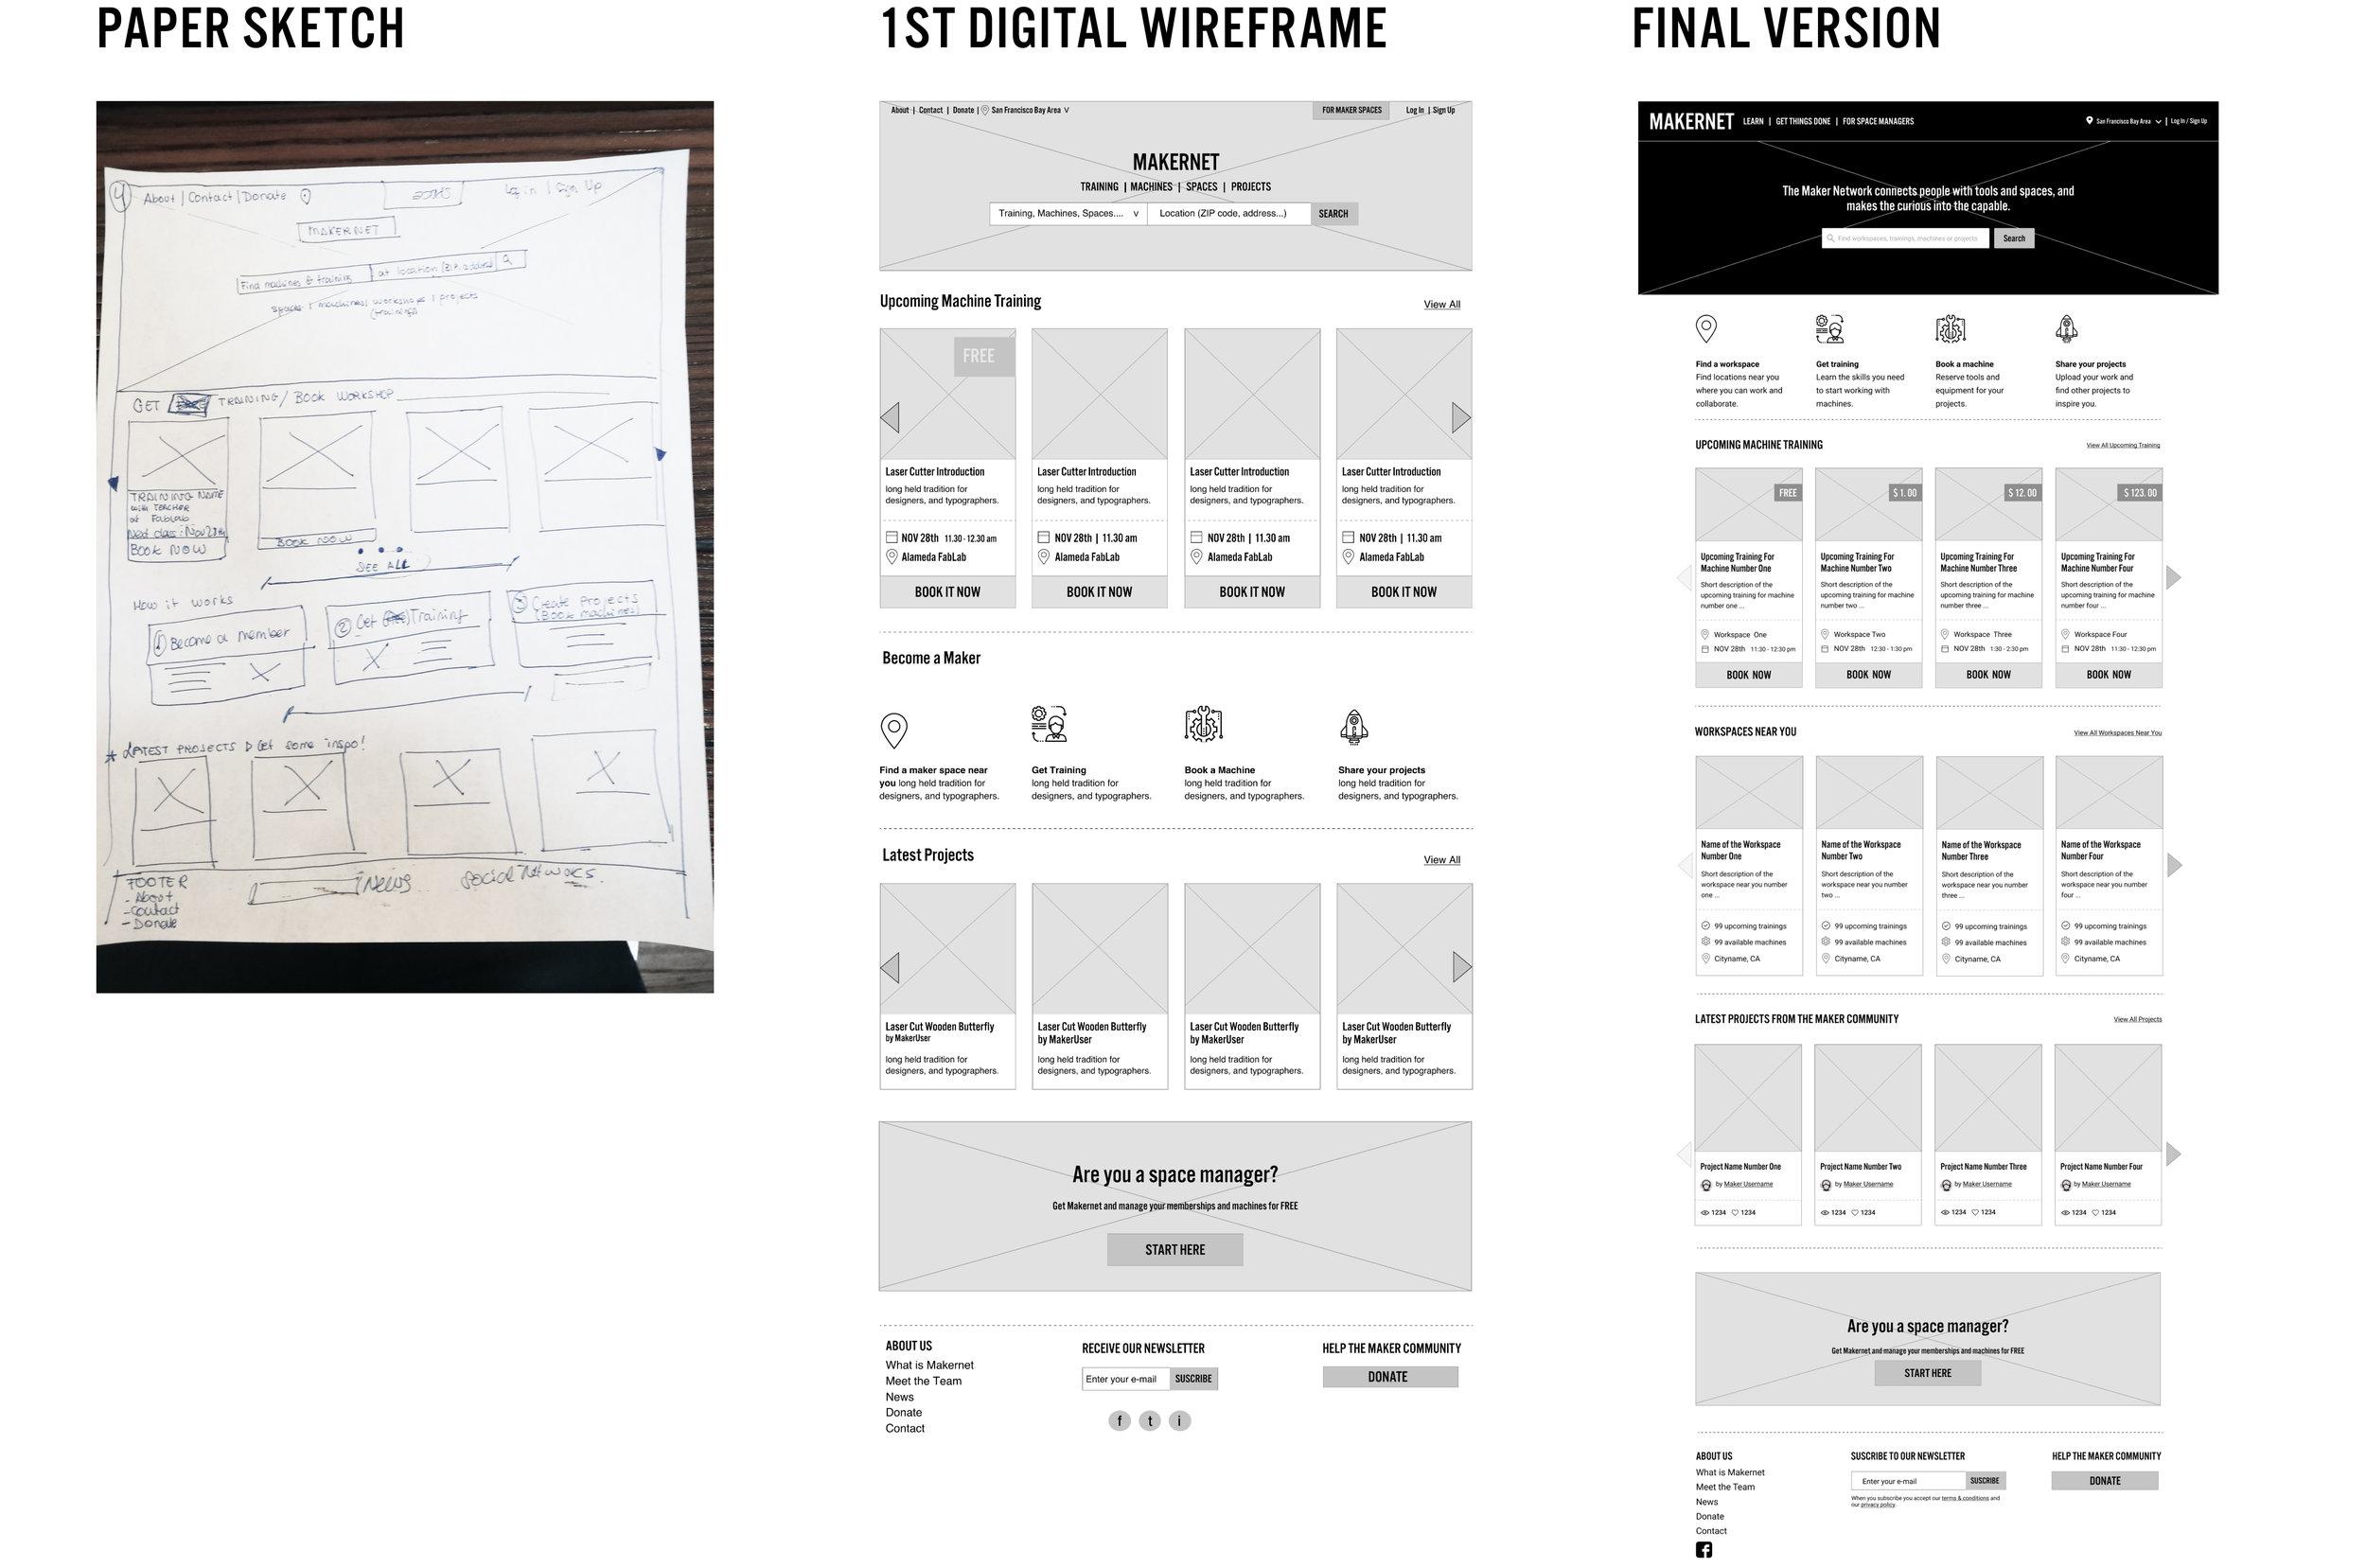 Design_Iterations.jpg